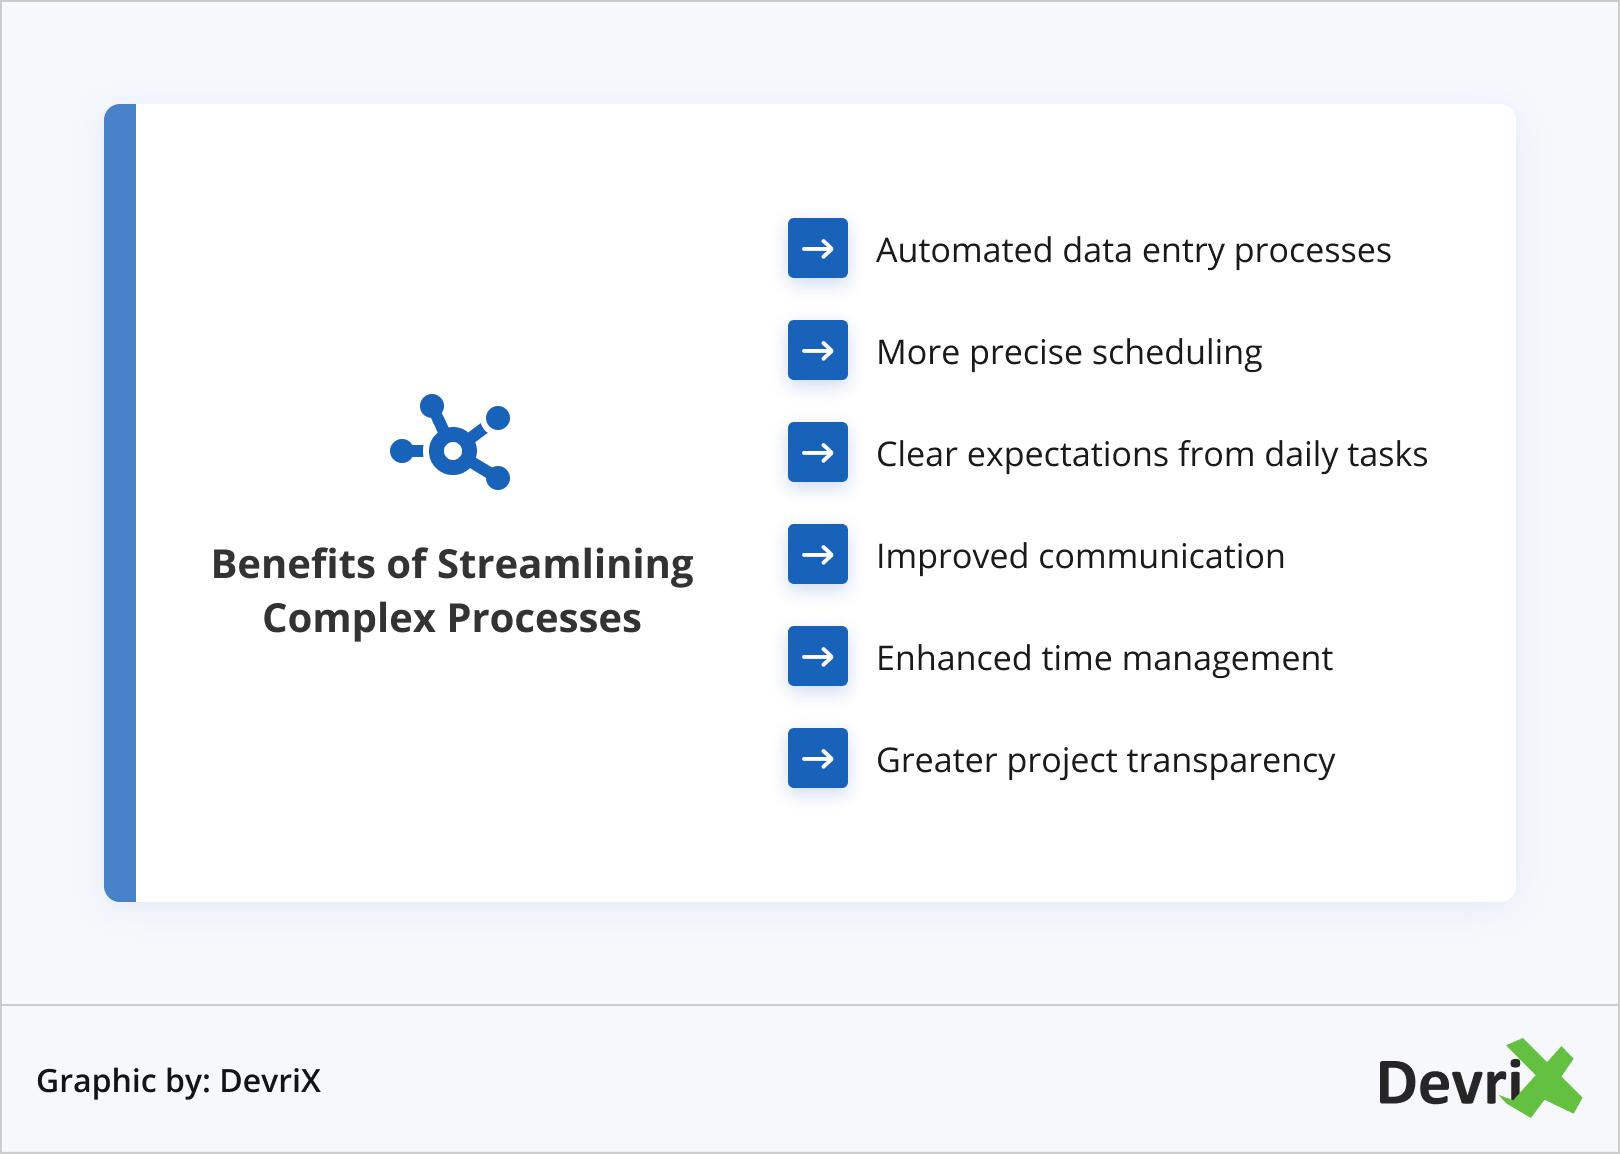 Benefits of Streamlining Complex Processes